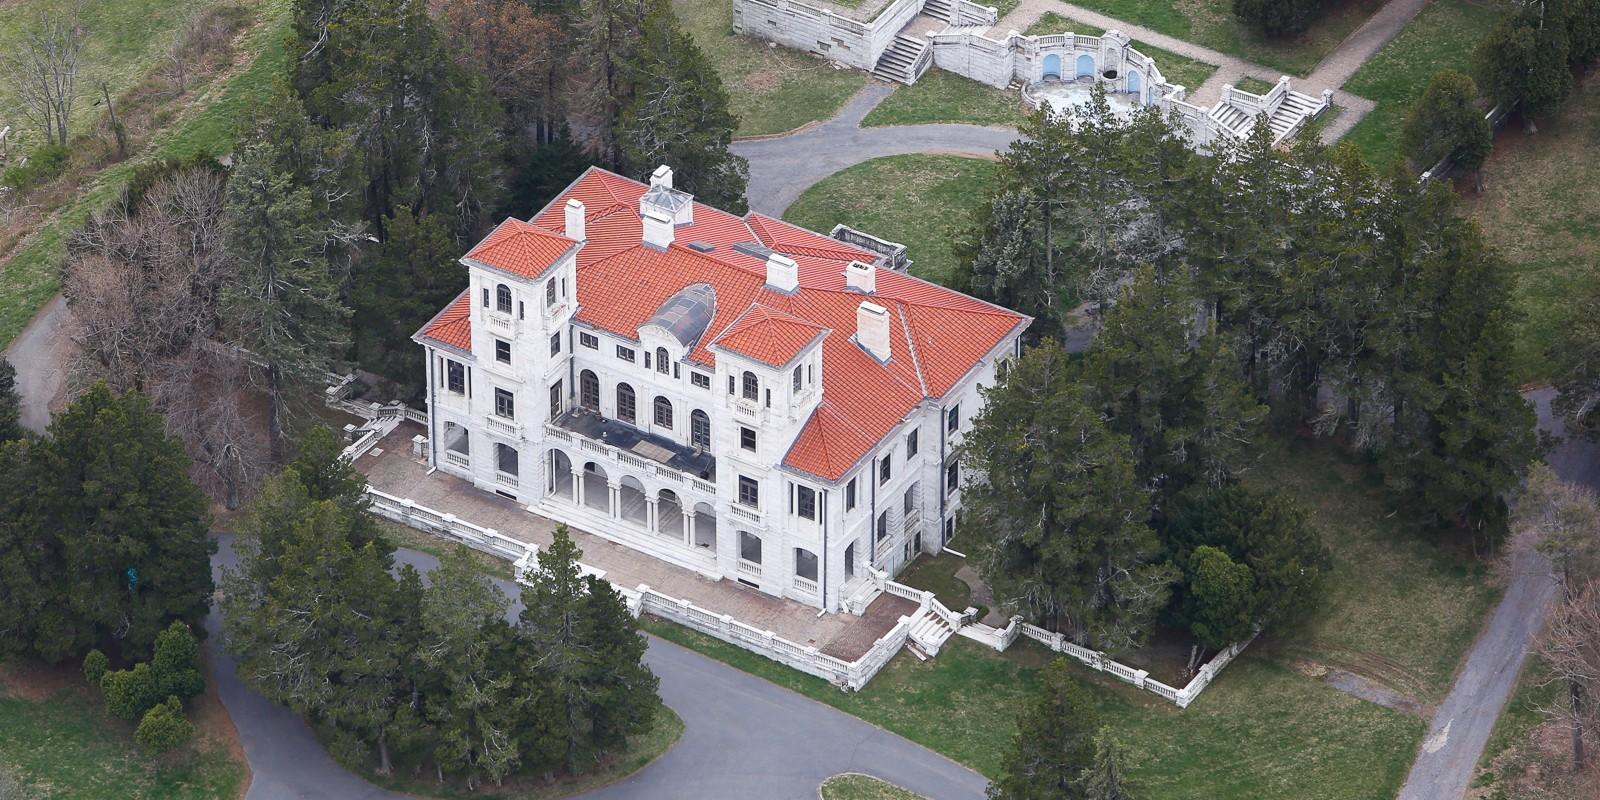 Swannanoa Aerial Picture